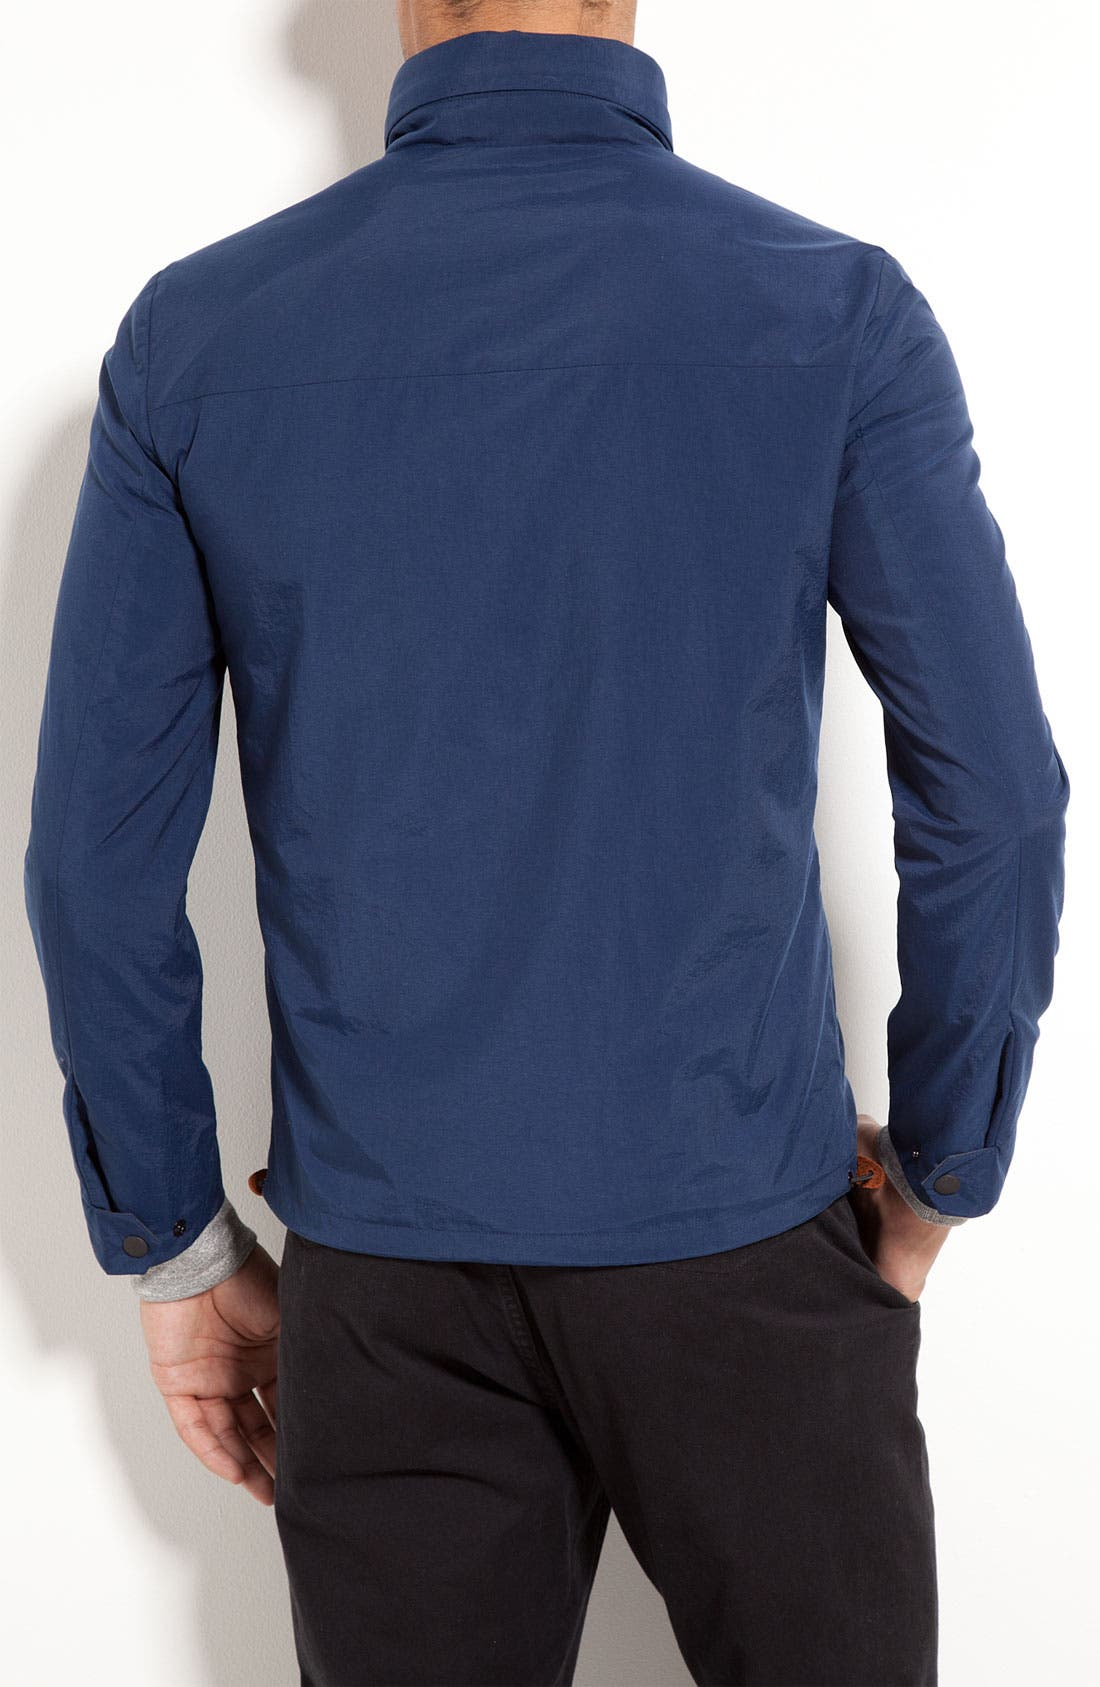 RAG & BONE,                             'Yorke' Jacket,                             Alternate thumbnail 3, color,                             402